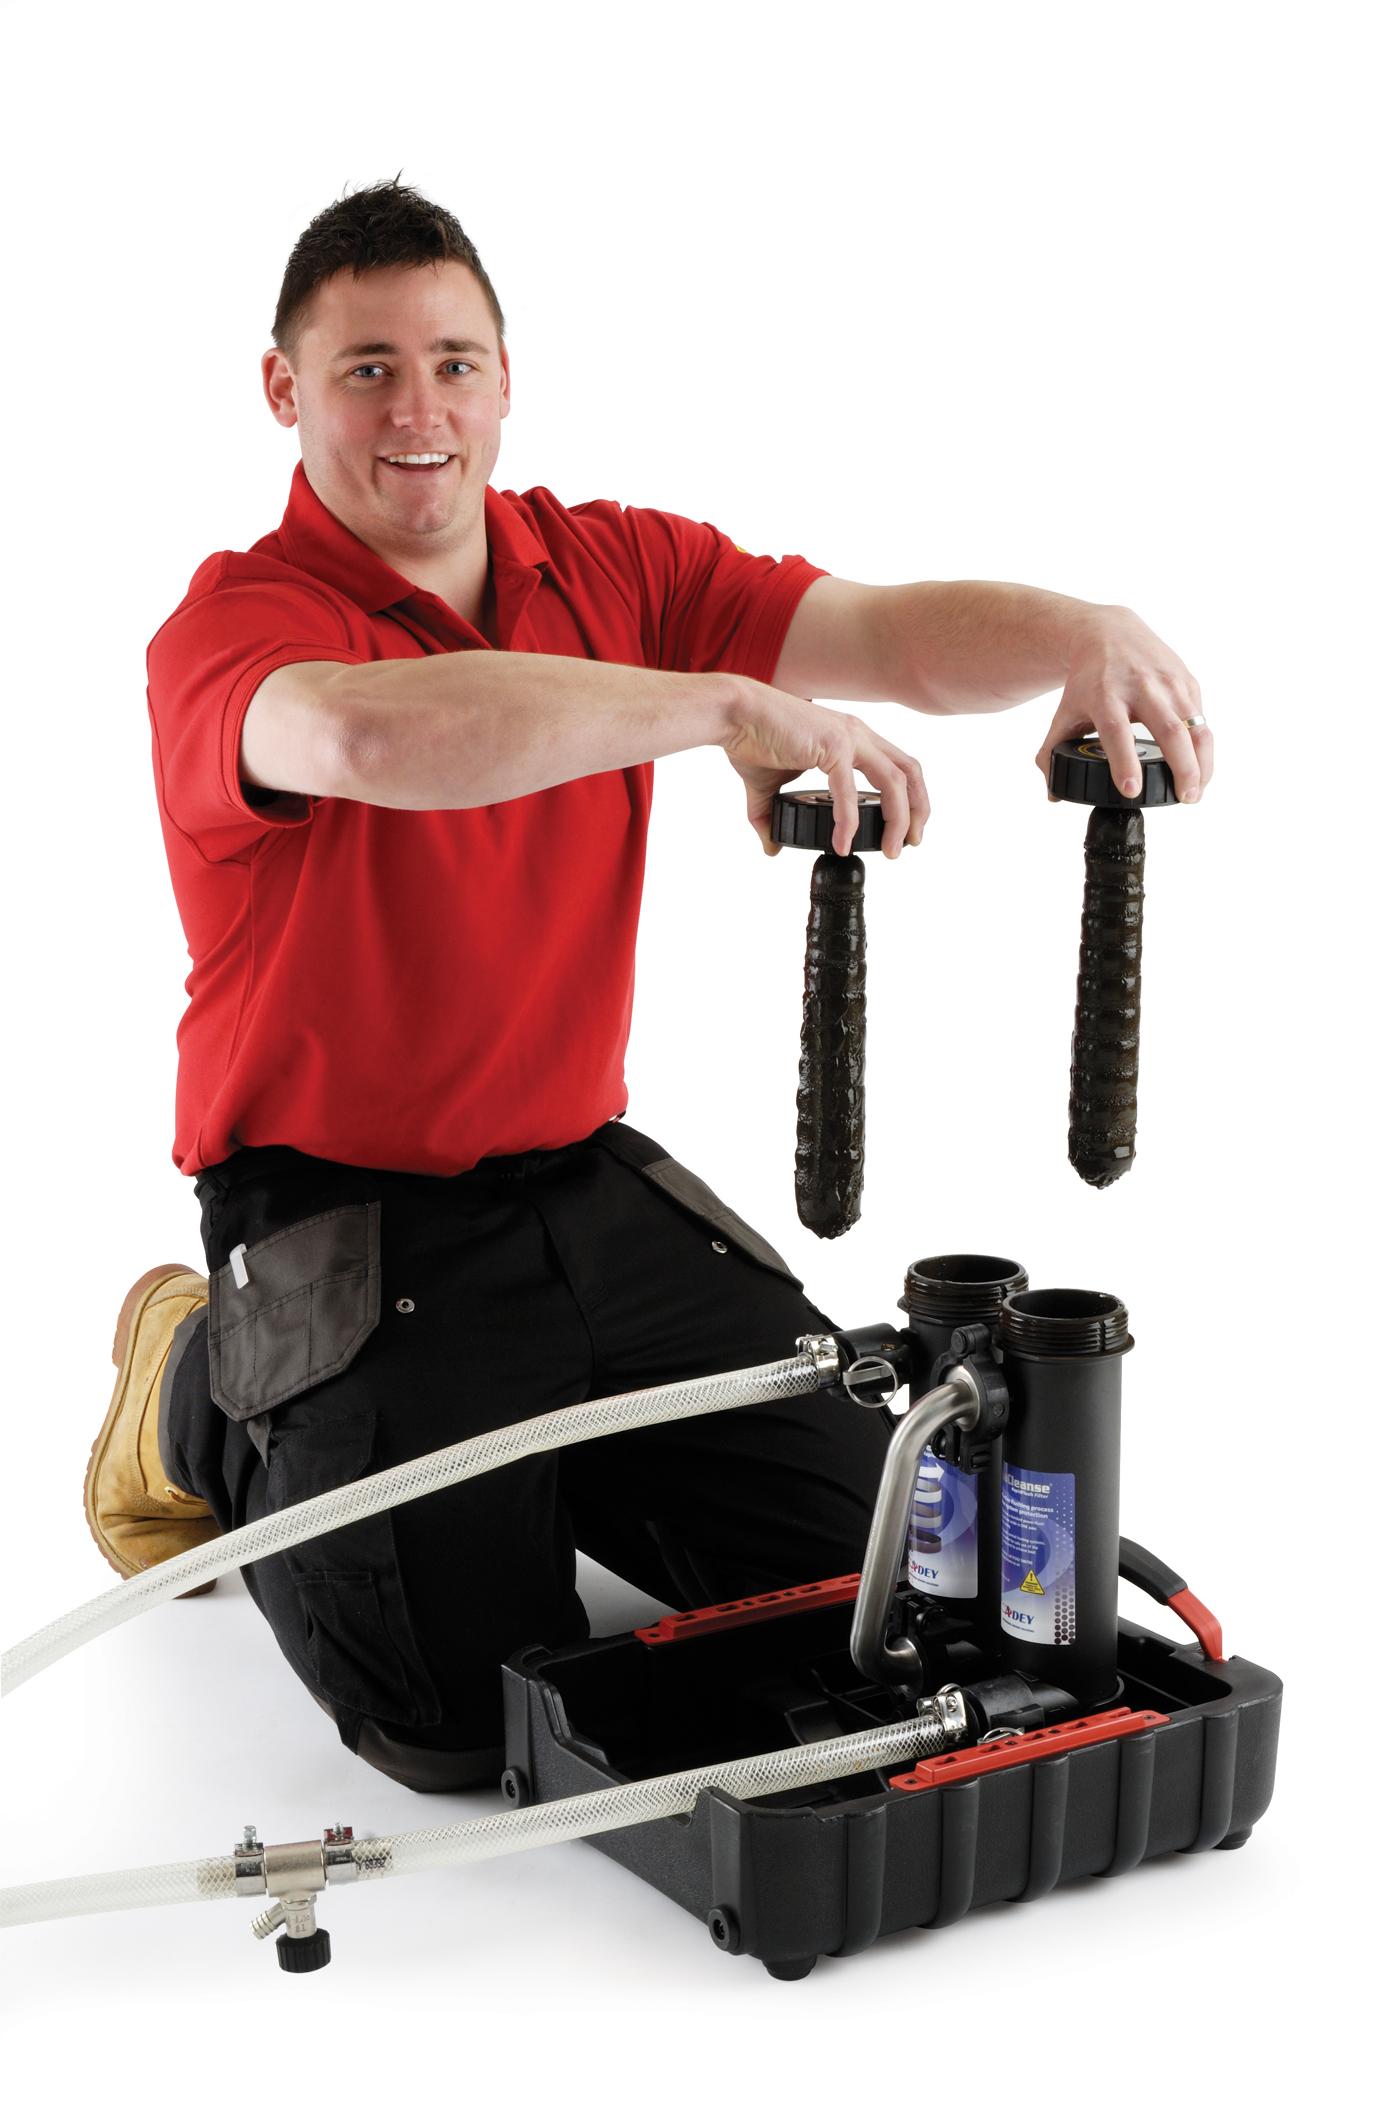 Bluewater Plumbing - MagnaCleanse Installer